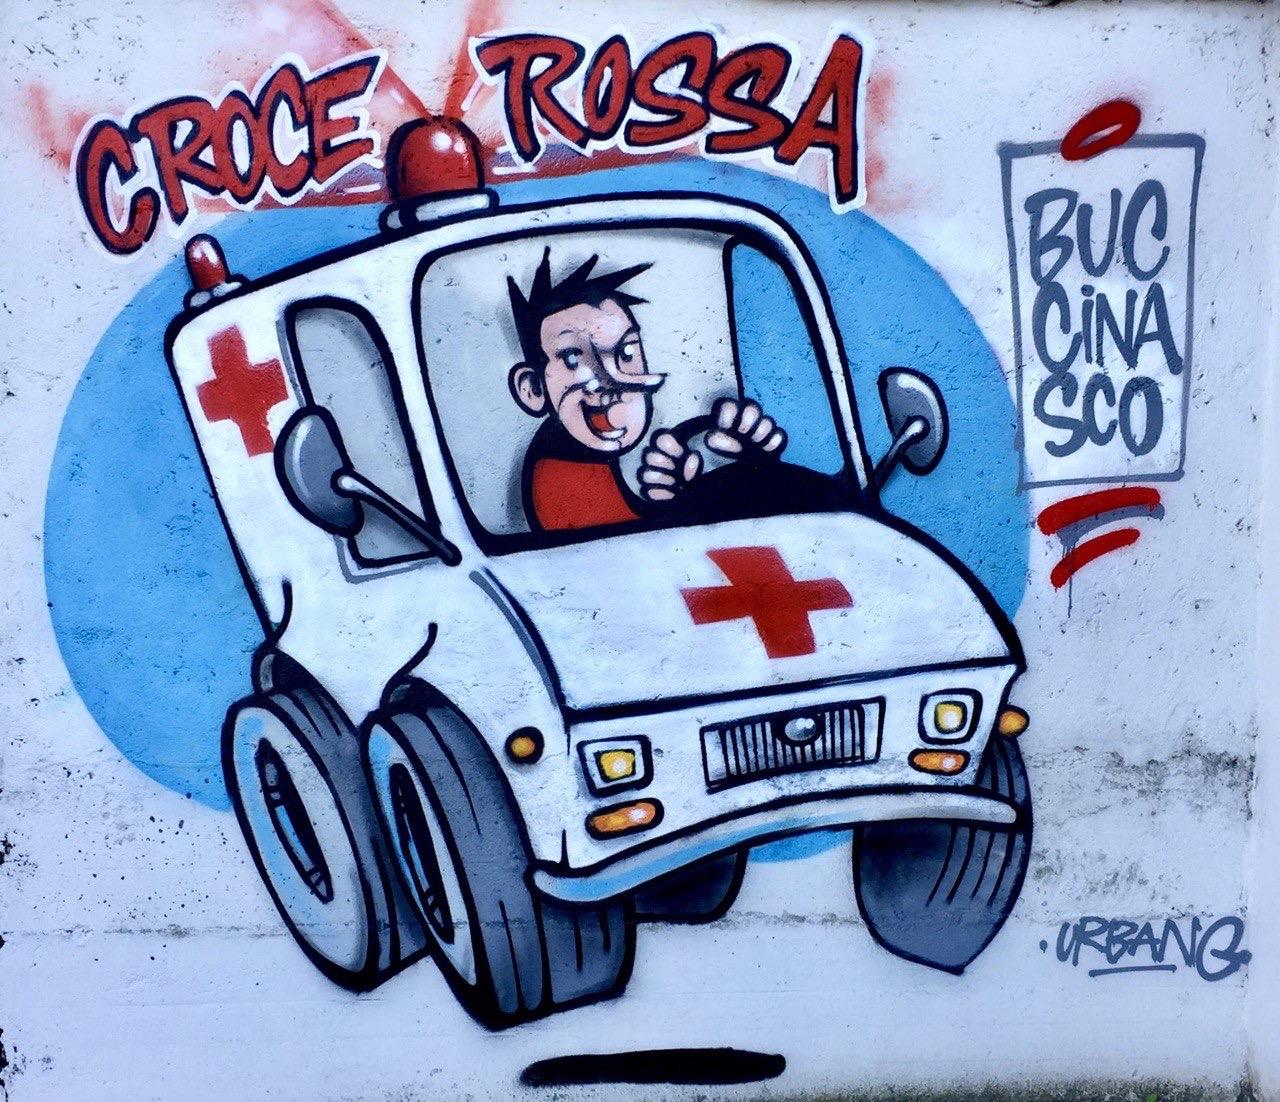 Croce Rossa Buccinasco